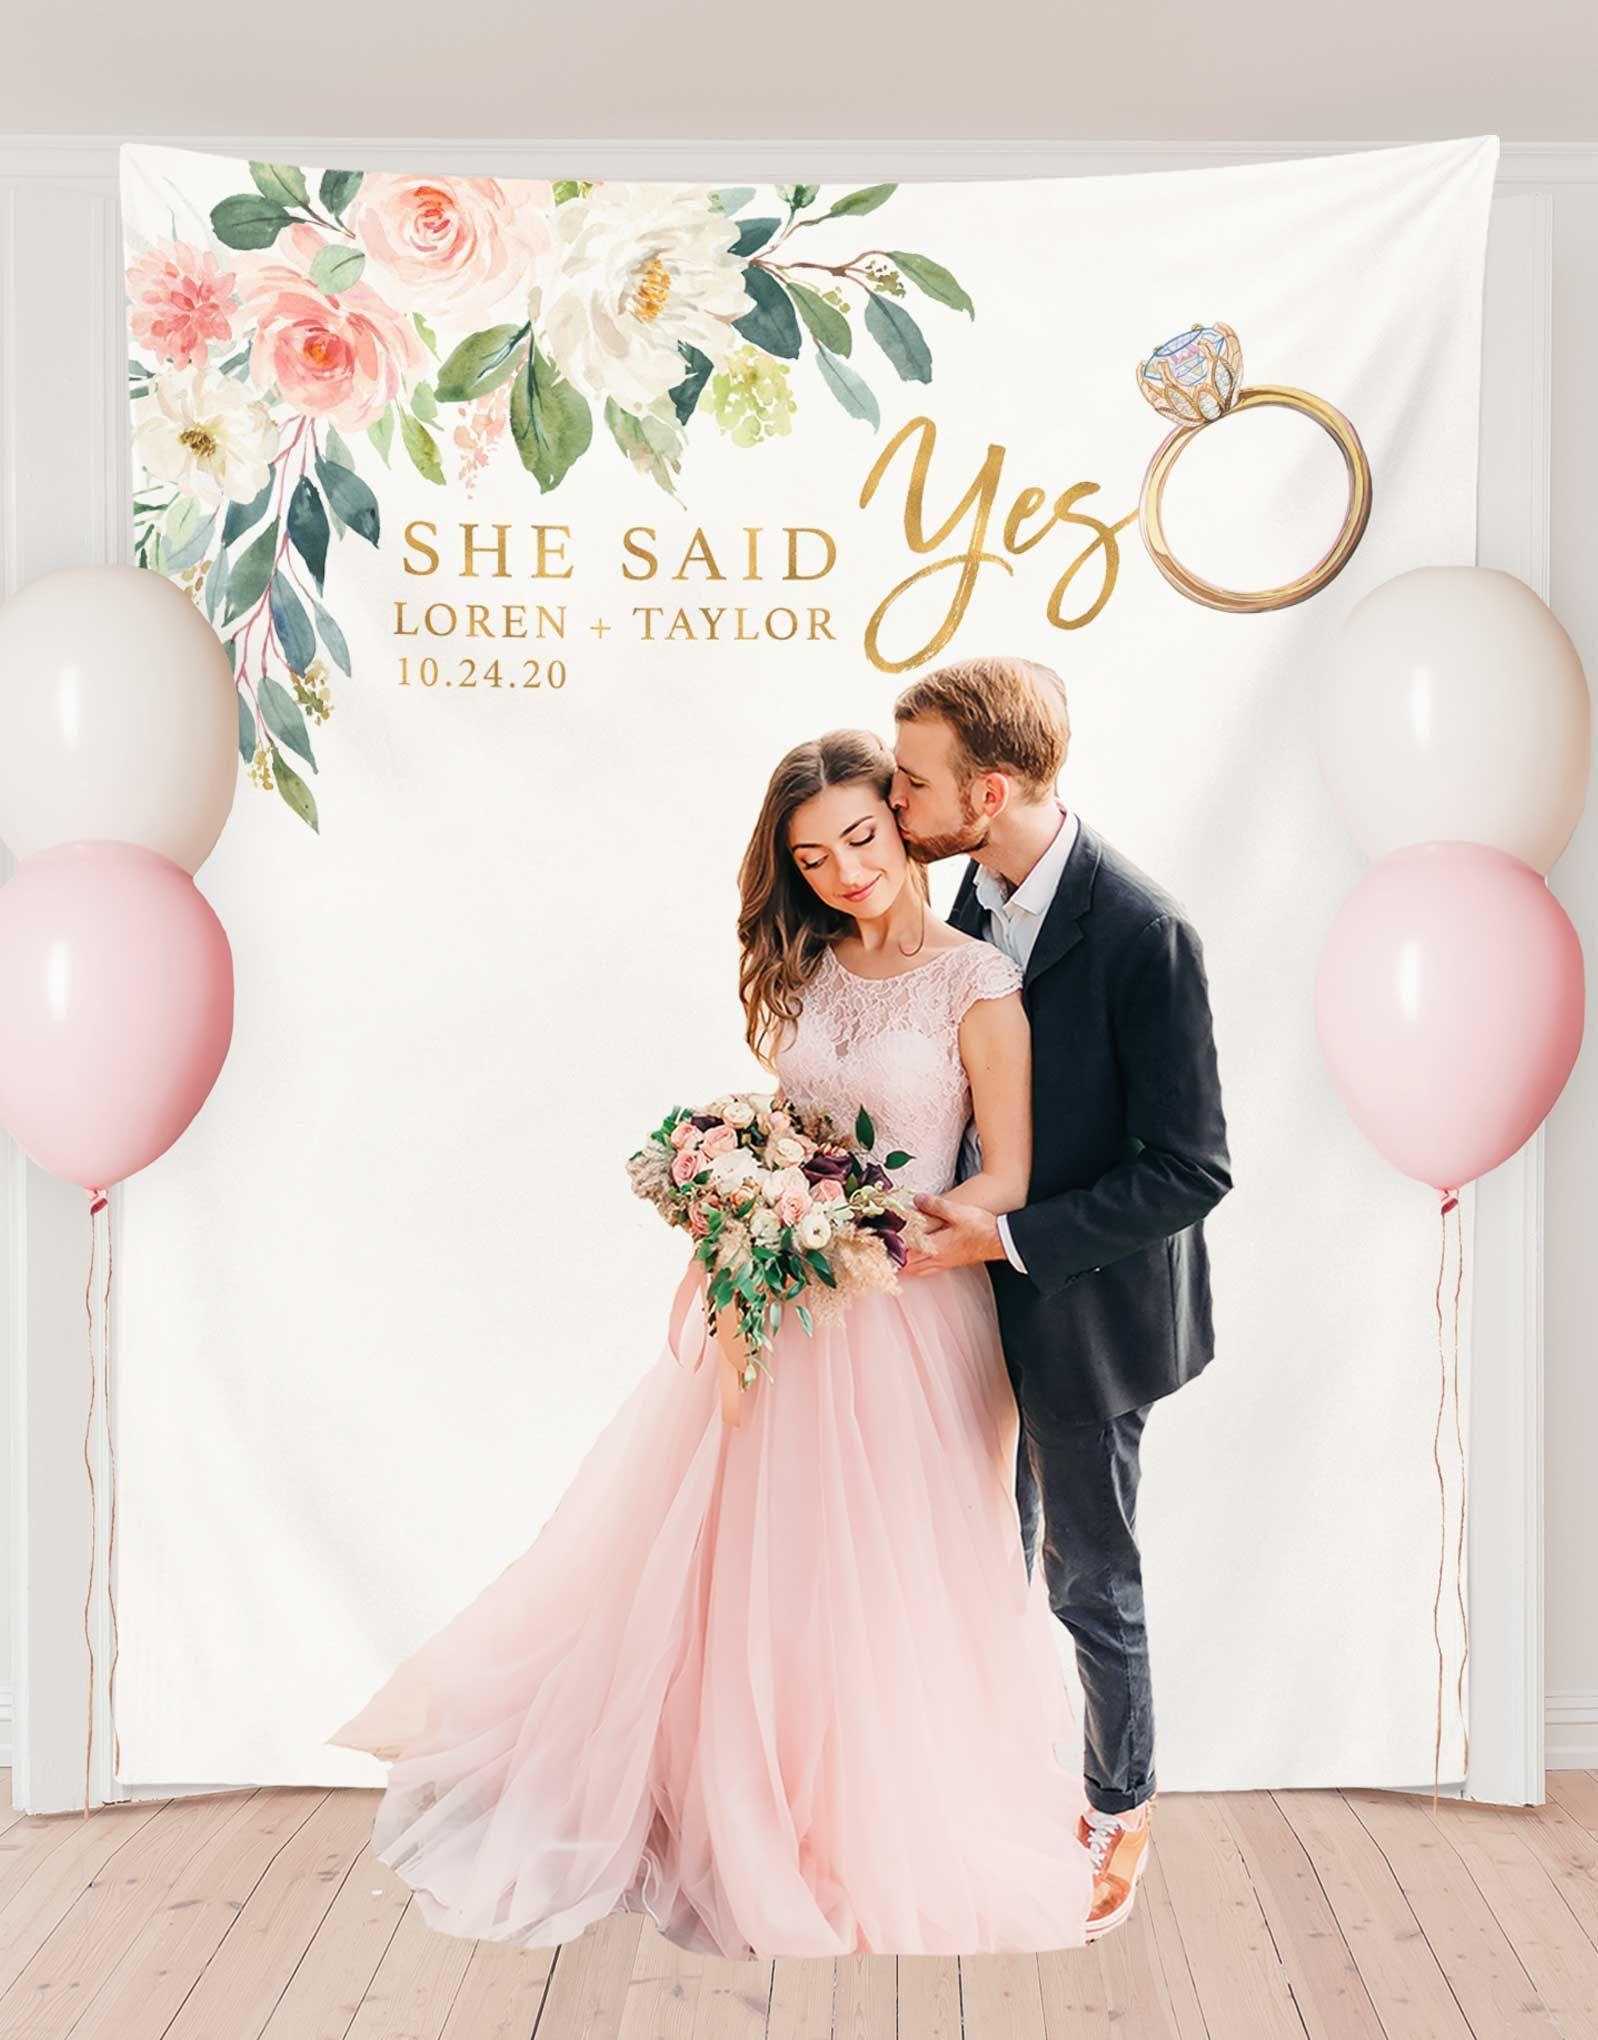 She Said Yes Backdrop, Engagement Party Photo Backdrop Design